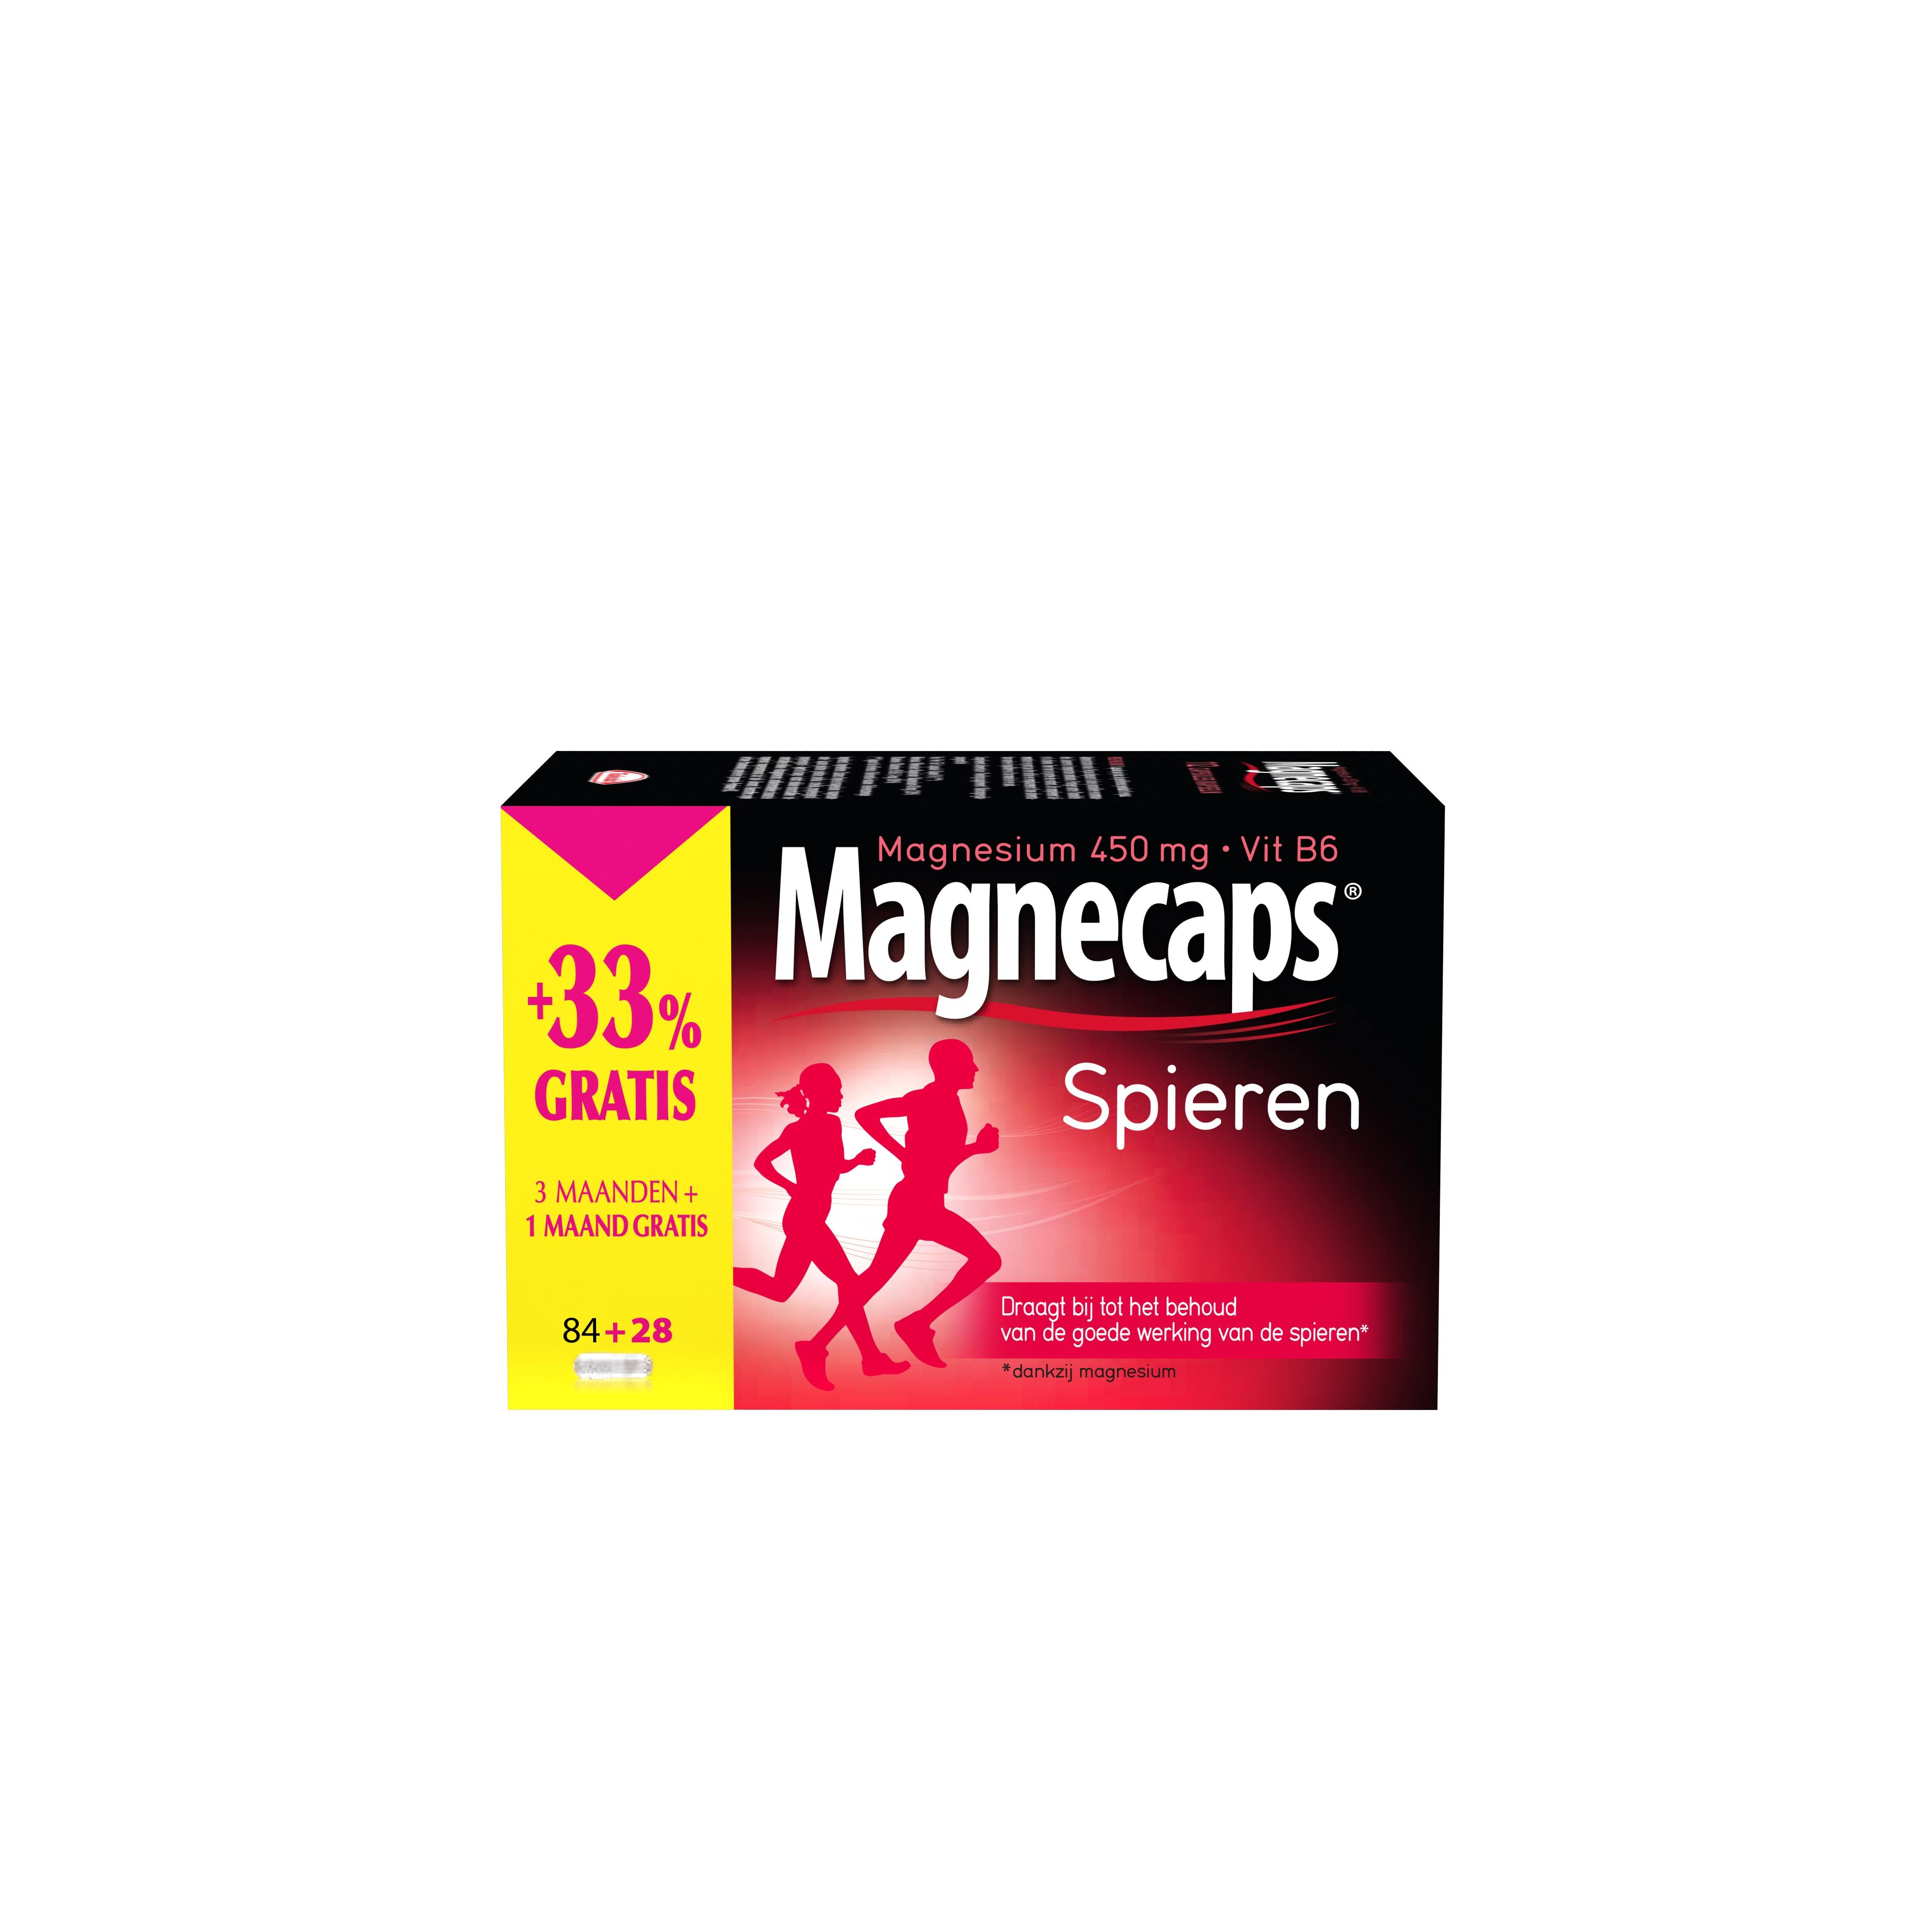 Image of Magnecaps Spieren Promo